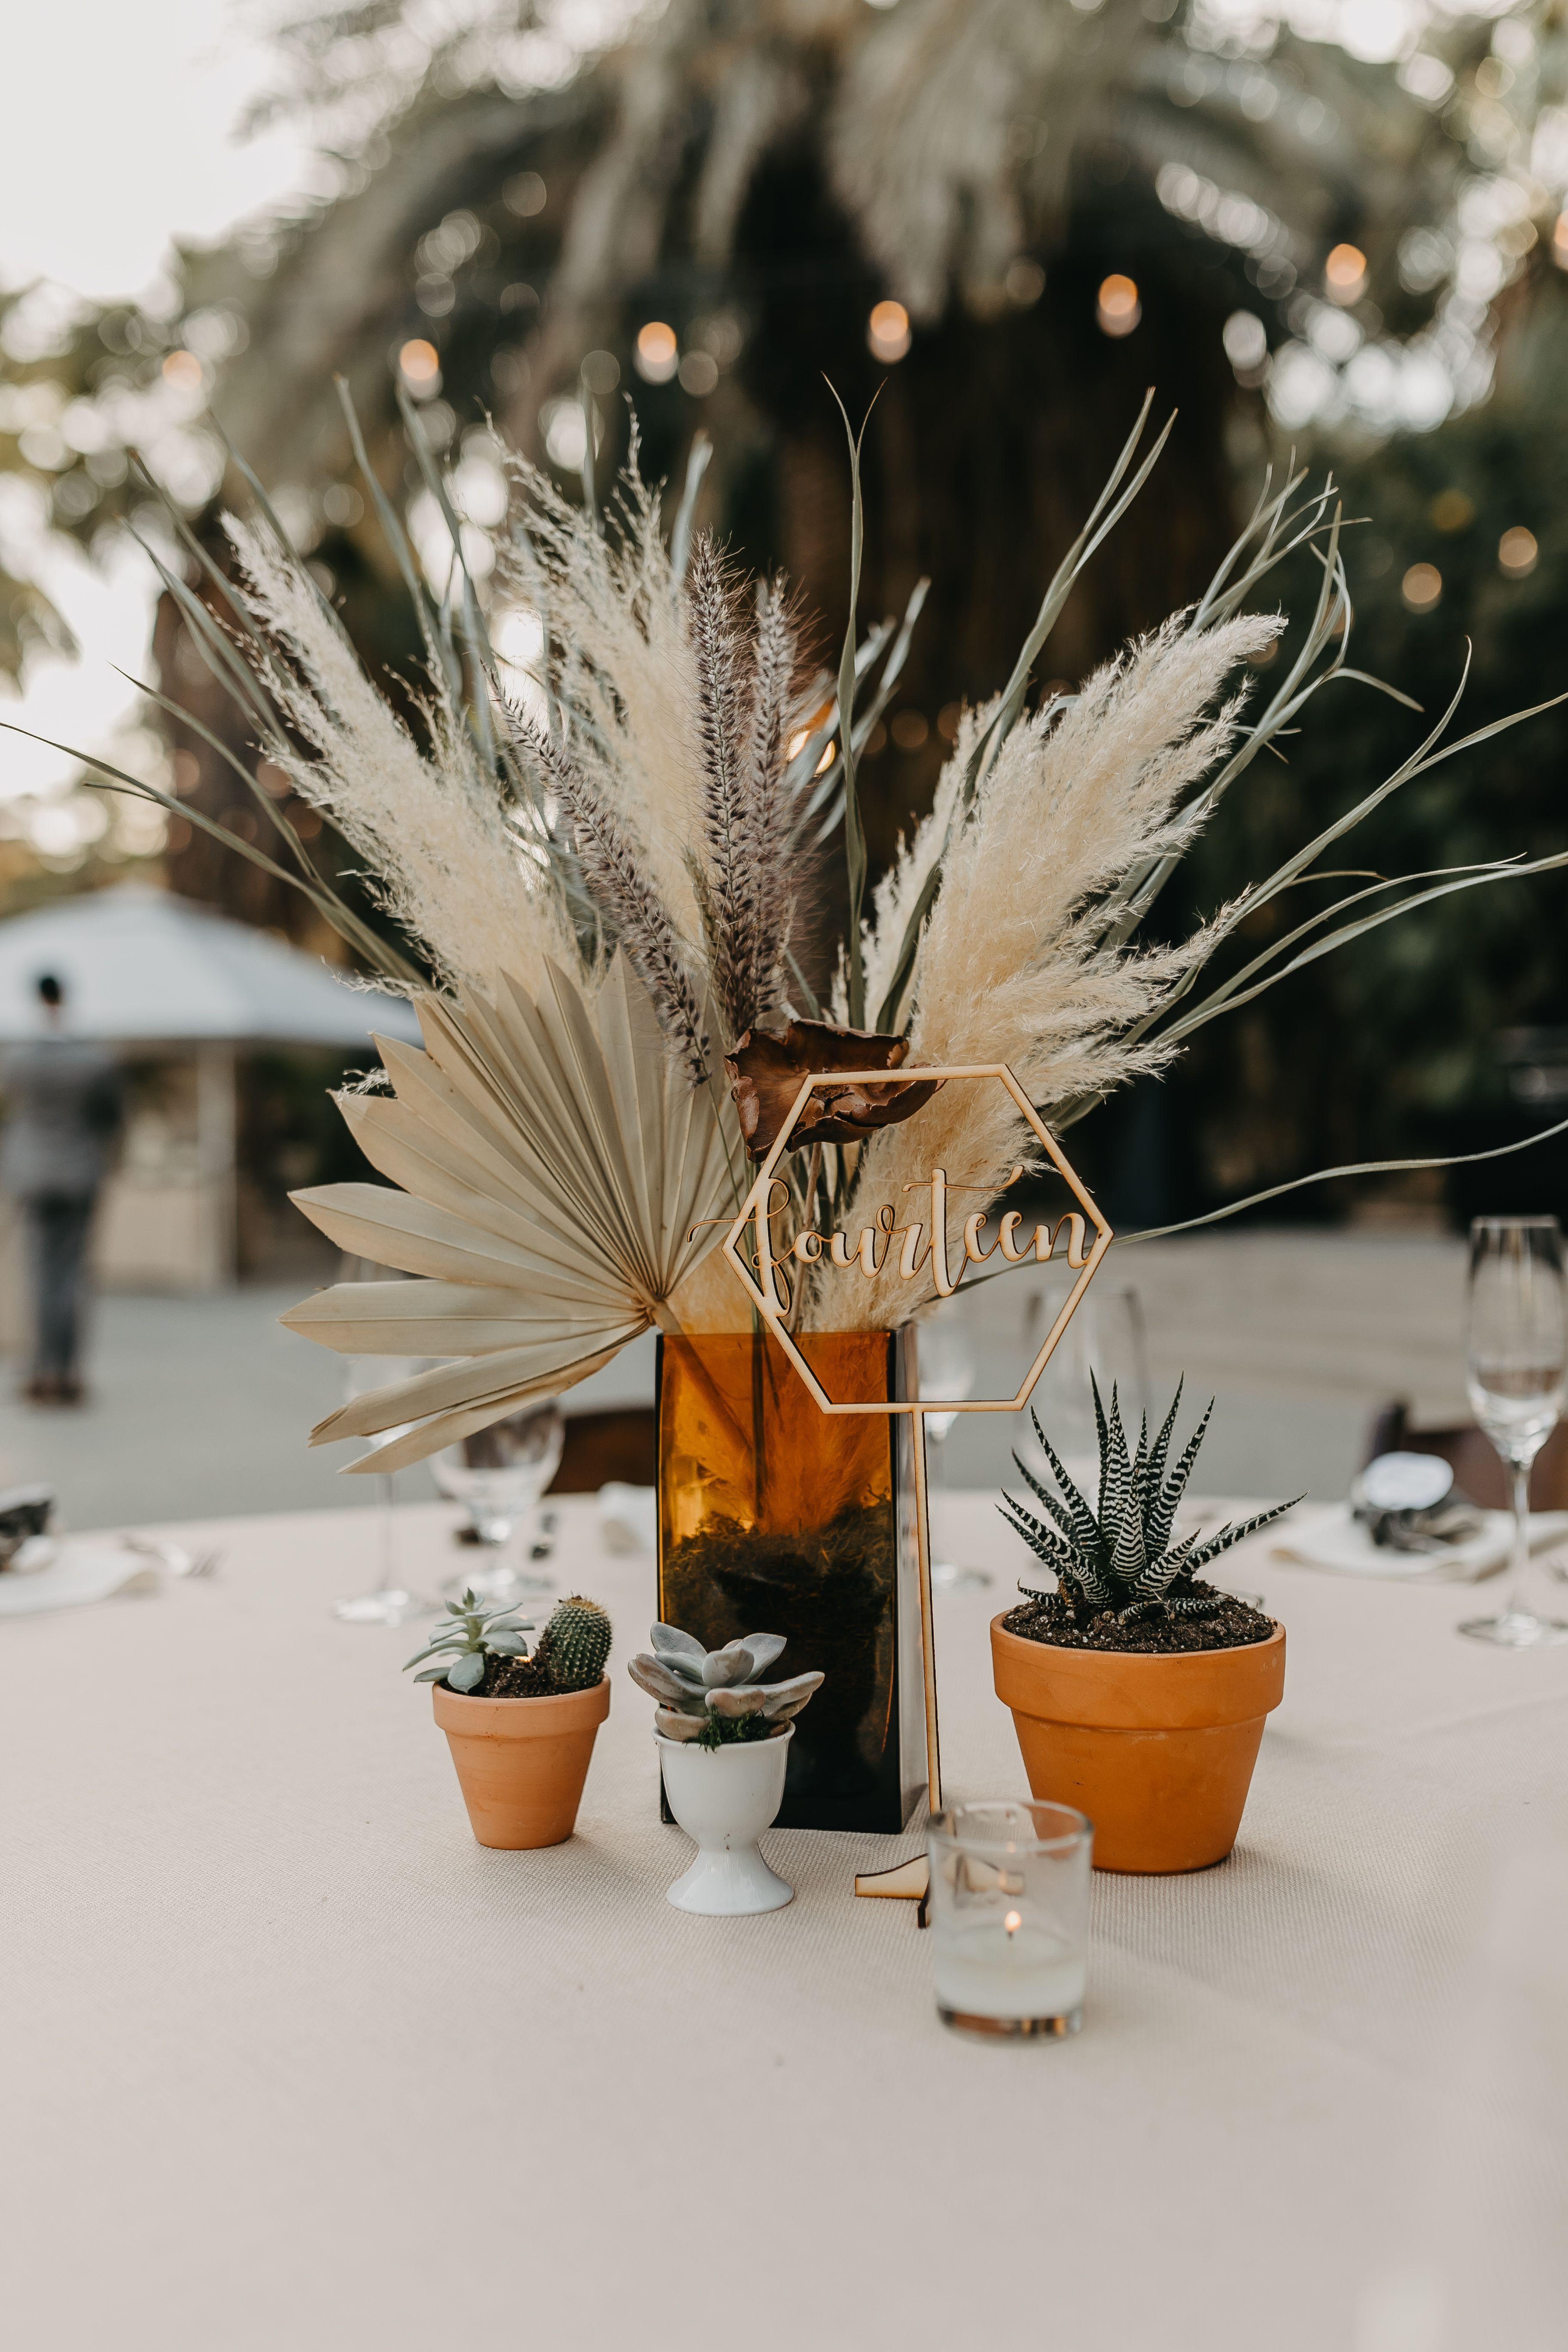 Diy wedding centerpieces 859554278865792501 -  The Living Desert Zoo Wedding Palm Desert wedding, the living desert zoo and gardens, desert wedding, cactus centerpieces, succulent centerpieces, dri…  #Desert #living #Wedding Source by seriande0404